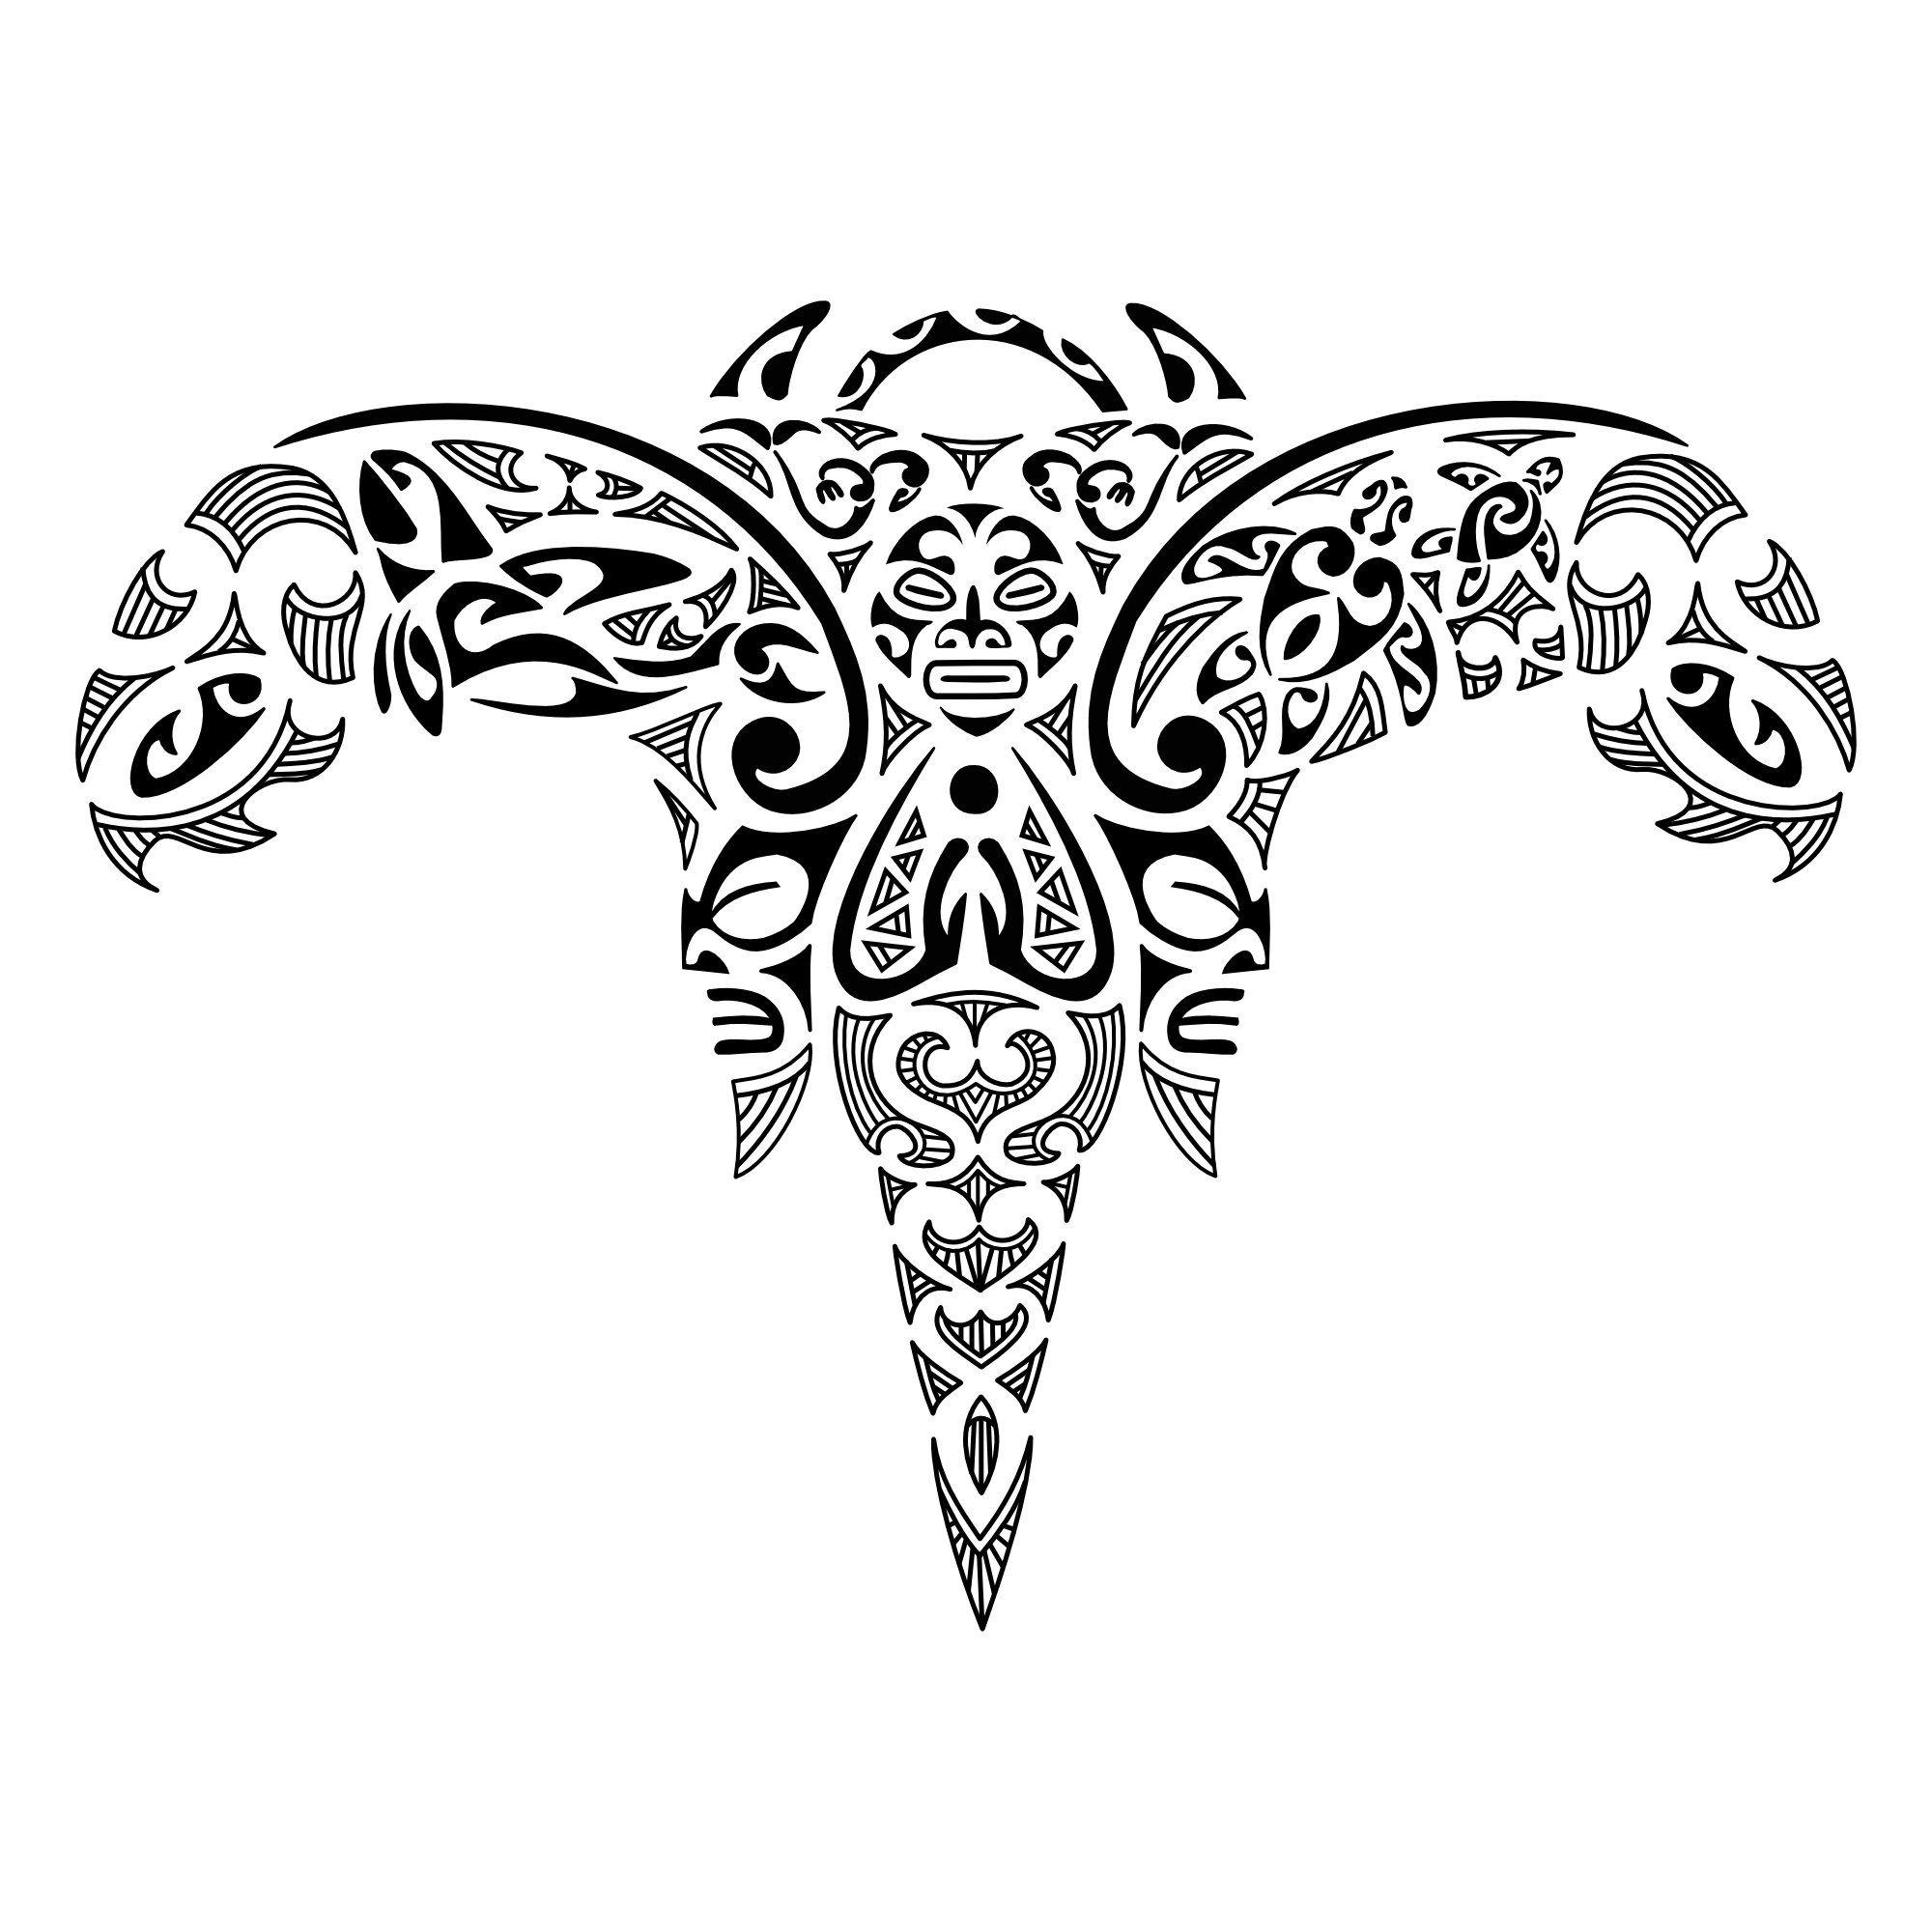 maori art maori angel piece tattoo maori engel tatoo. Black Bedroom Furniture Sets. Home Design Ideas